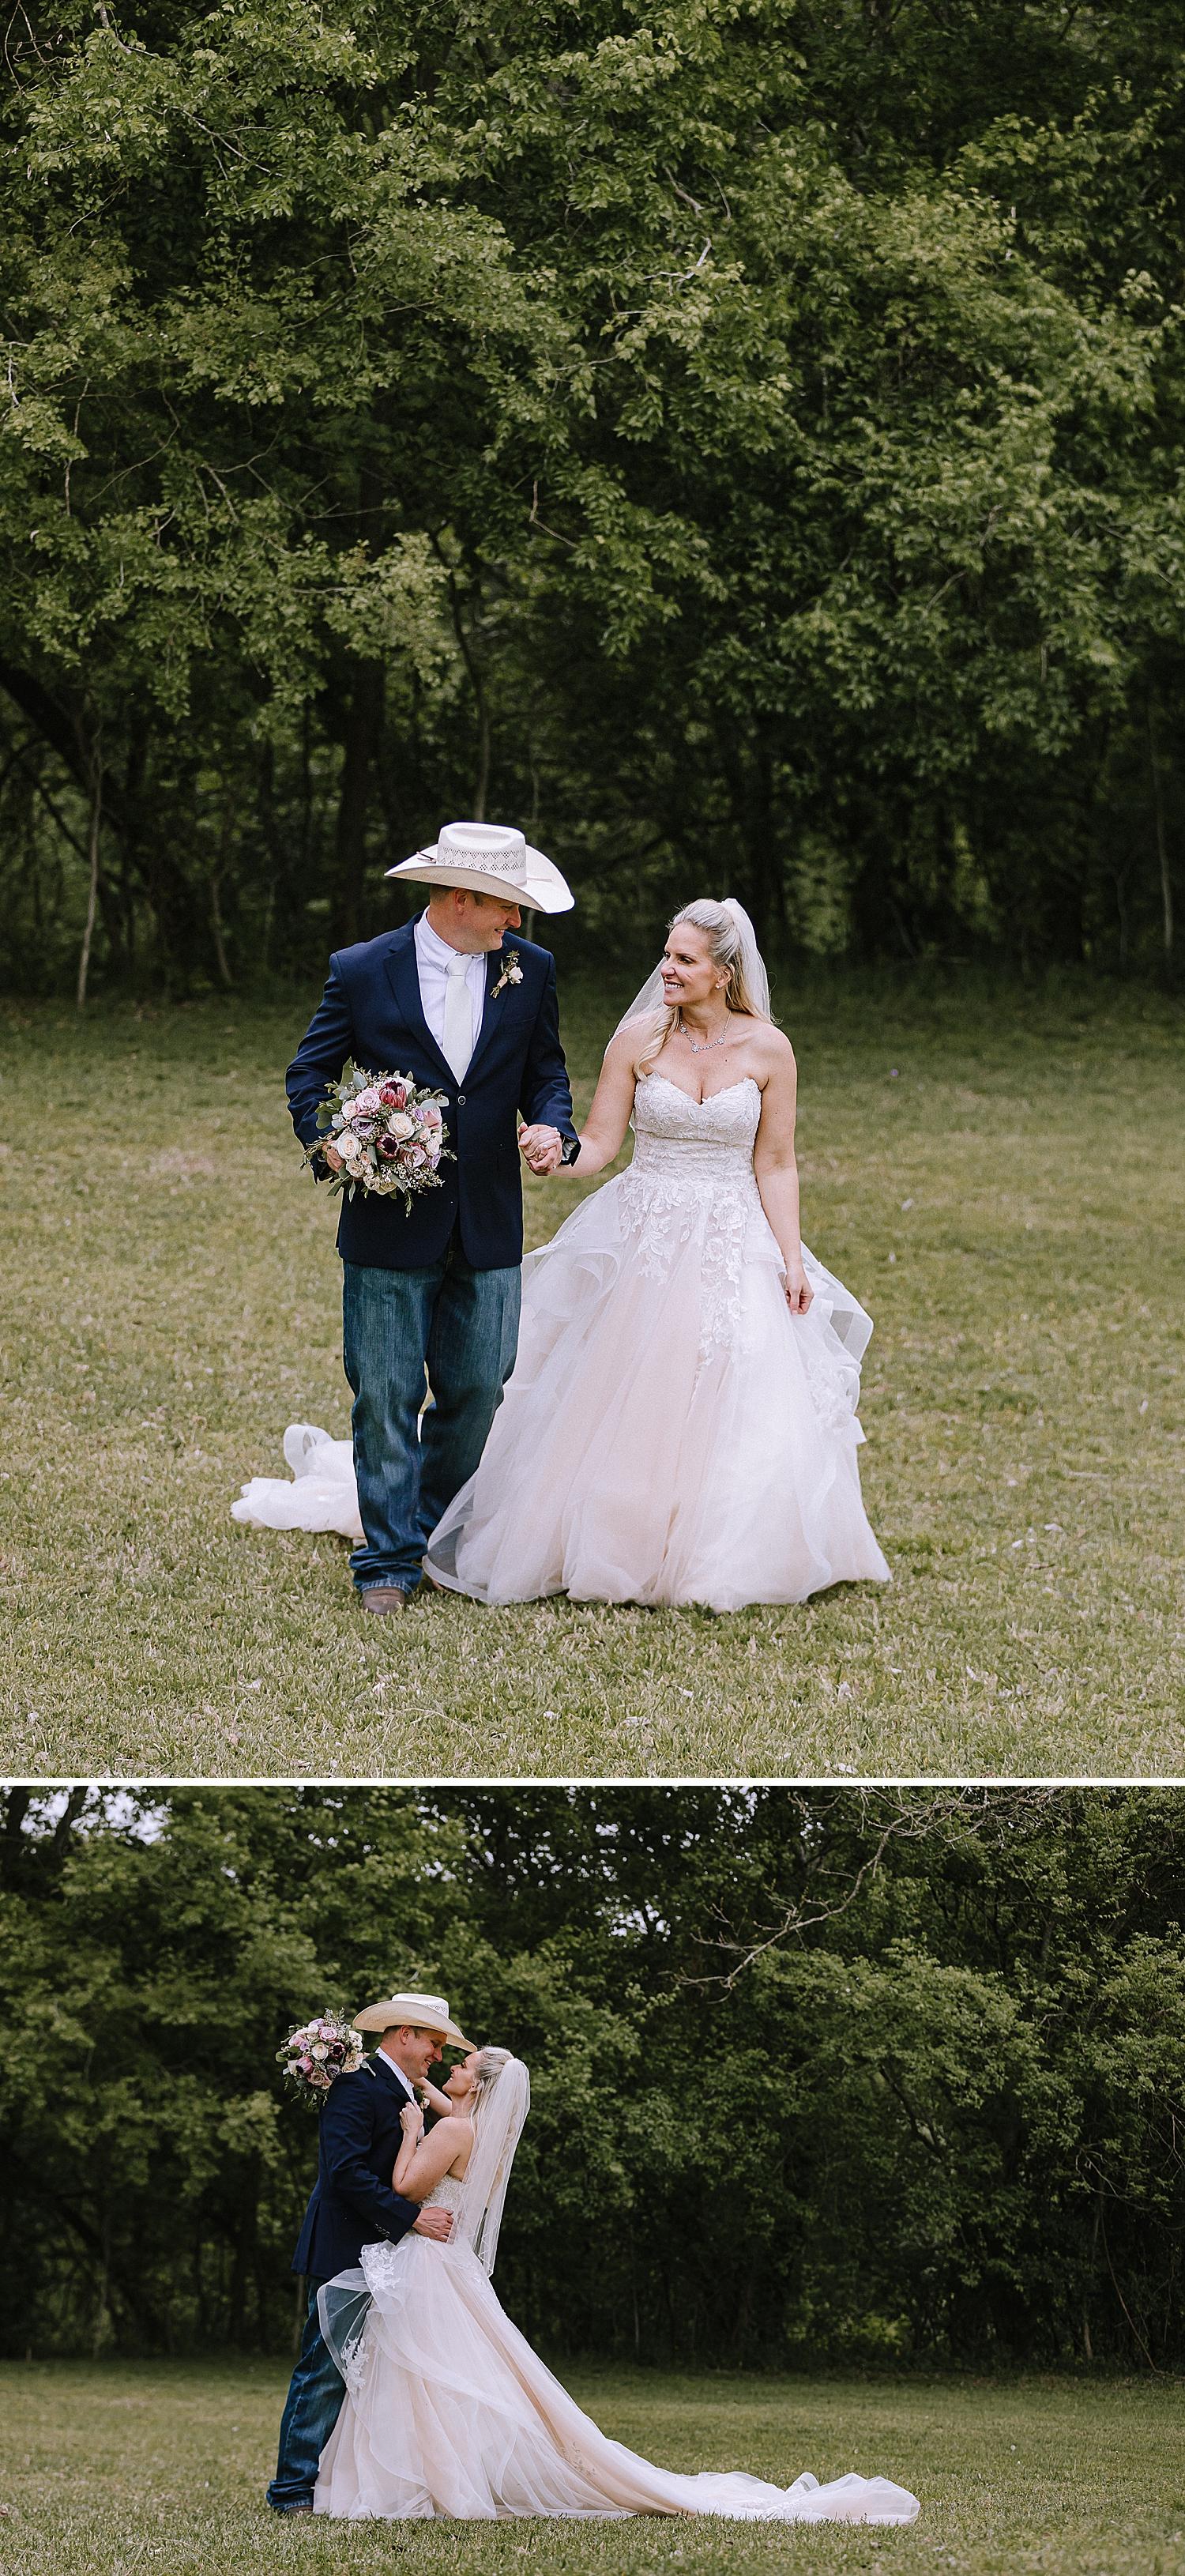 Rio-Cibilo-Ranch-Marion-Texas-Wedding-Rustic-Blush-Rose-Quartz-Details-Carly-Barton-Photography_0069.jpg